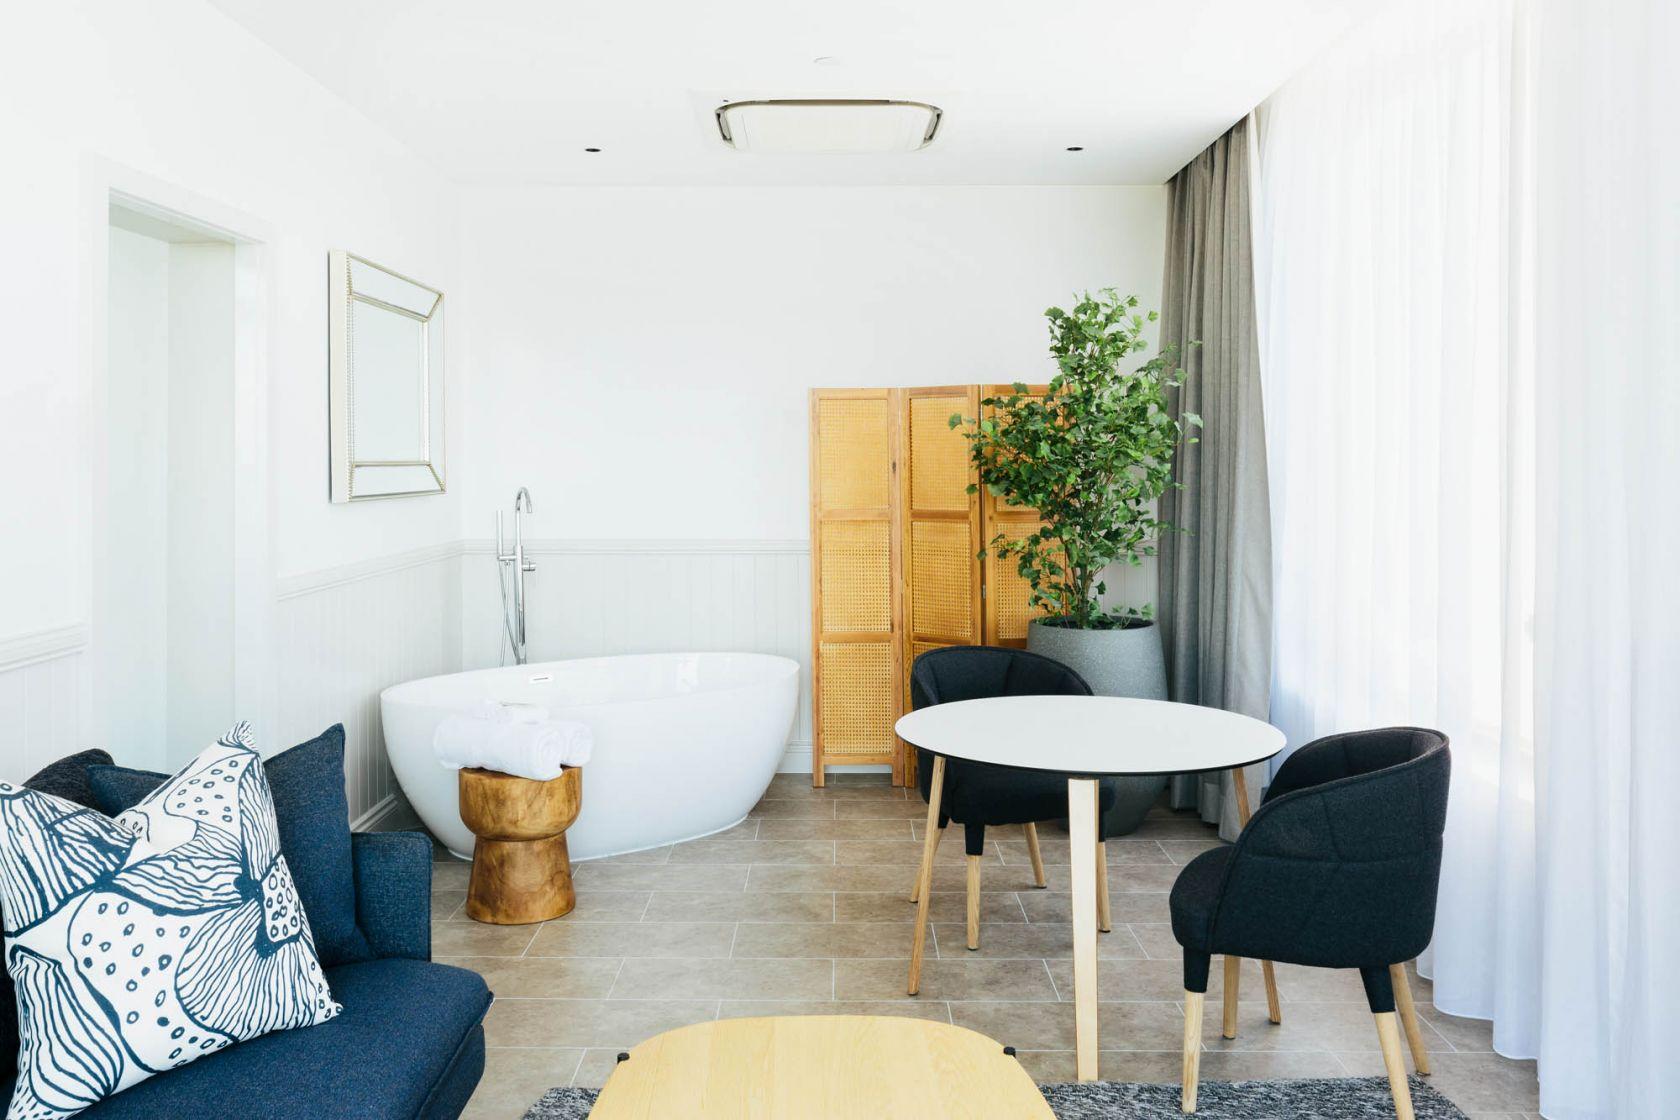 voco hotel gold coast fitout refurbishment construction executive suite retreat bathtub terrace